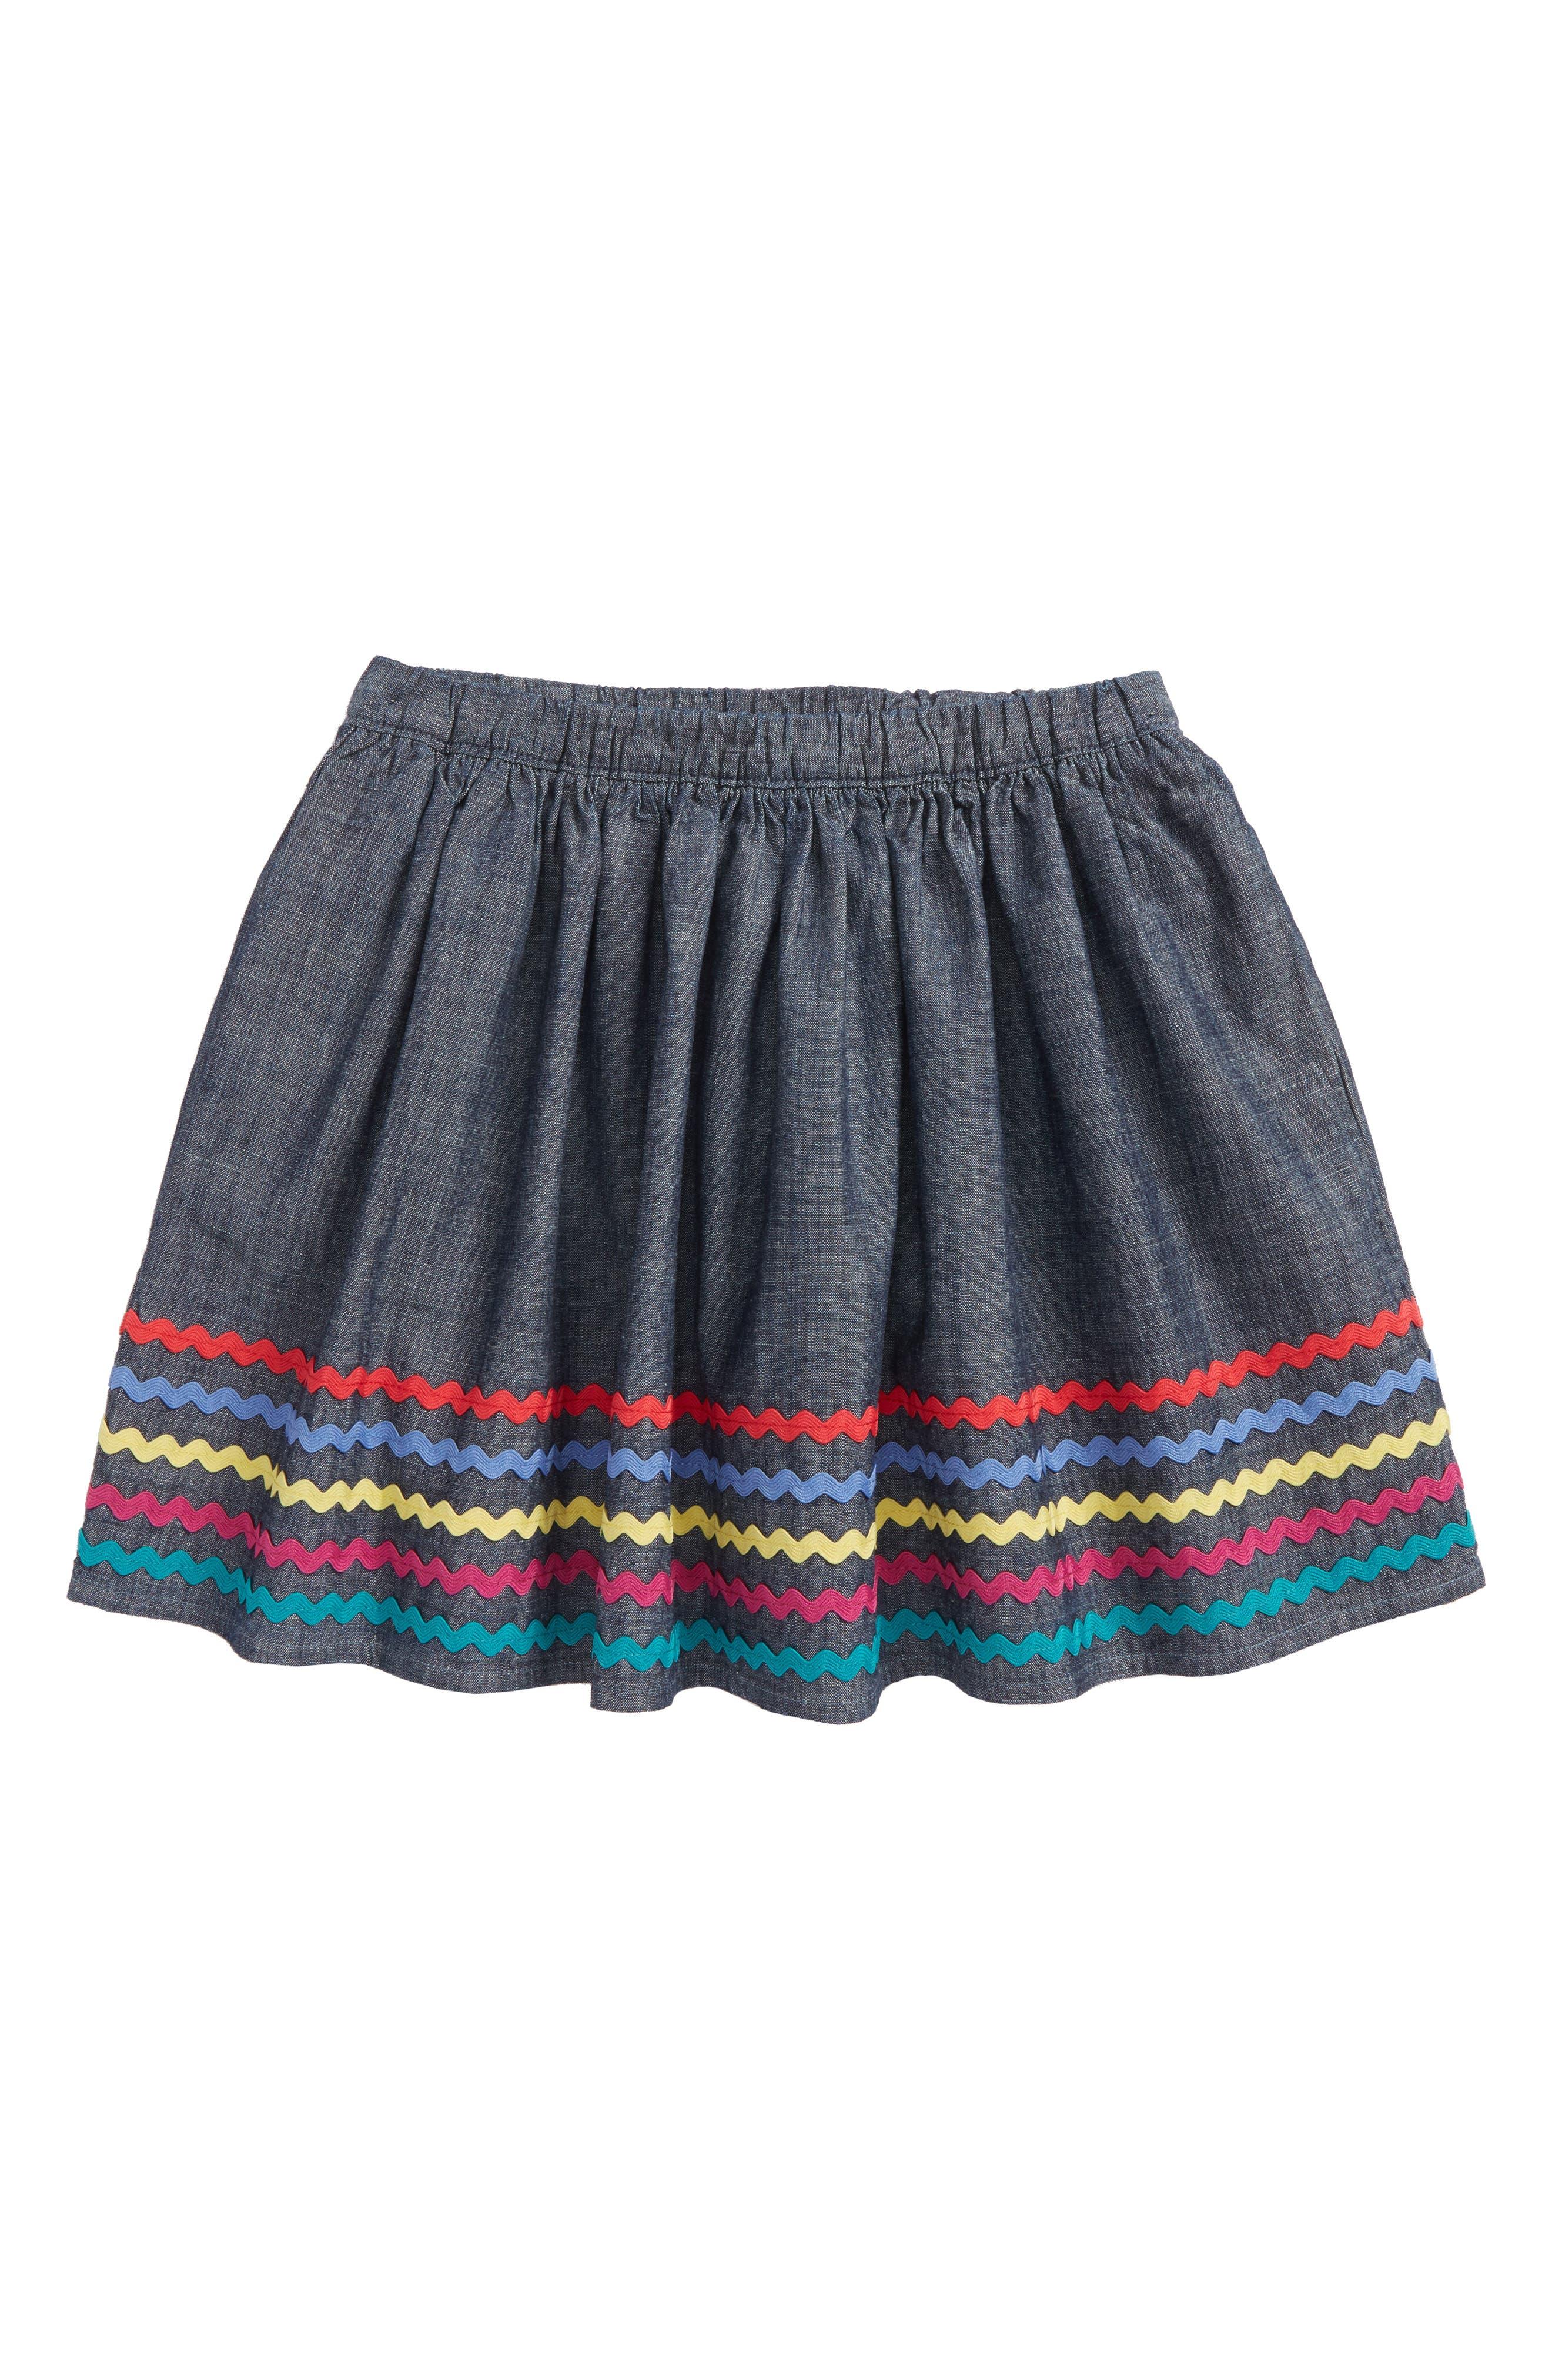 Rickrack Twirl Skirt,                             Main thumbnail 1, color,                             410